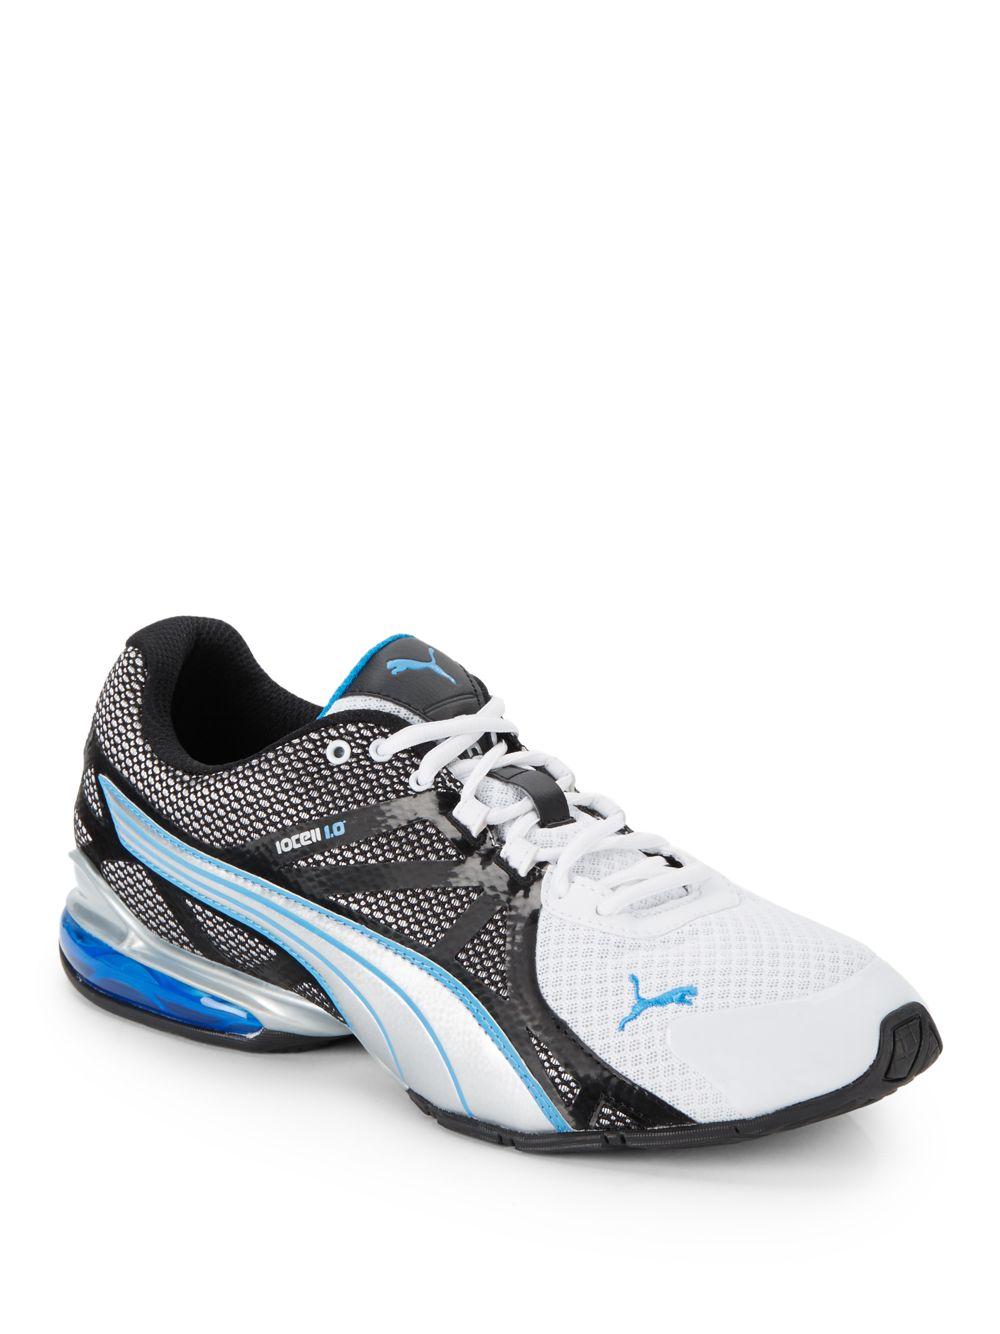 Puma Voltaic  Running Shoes